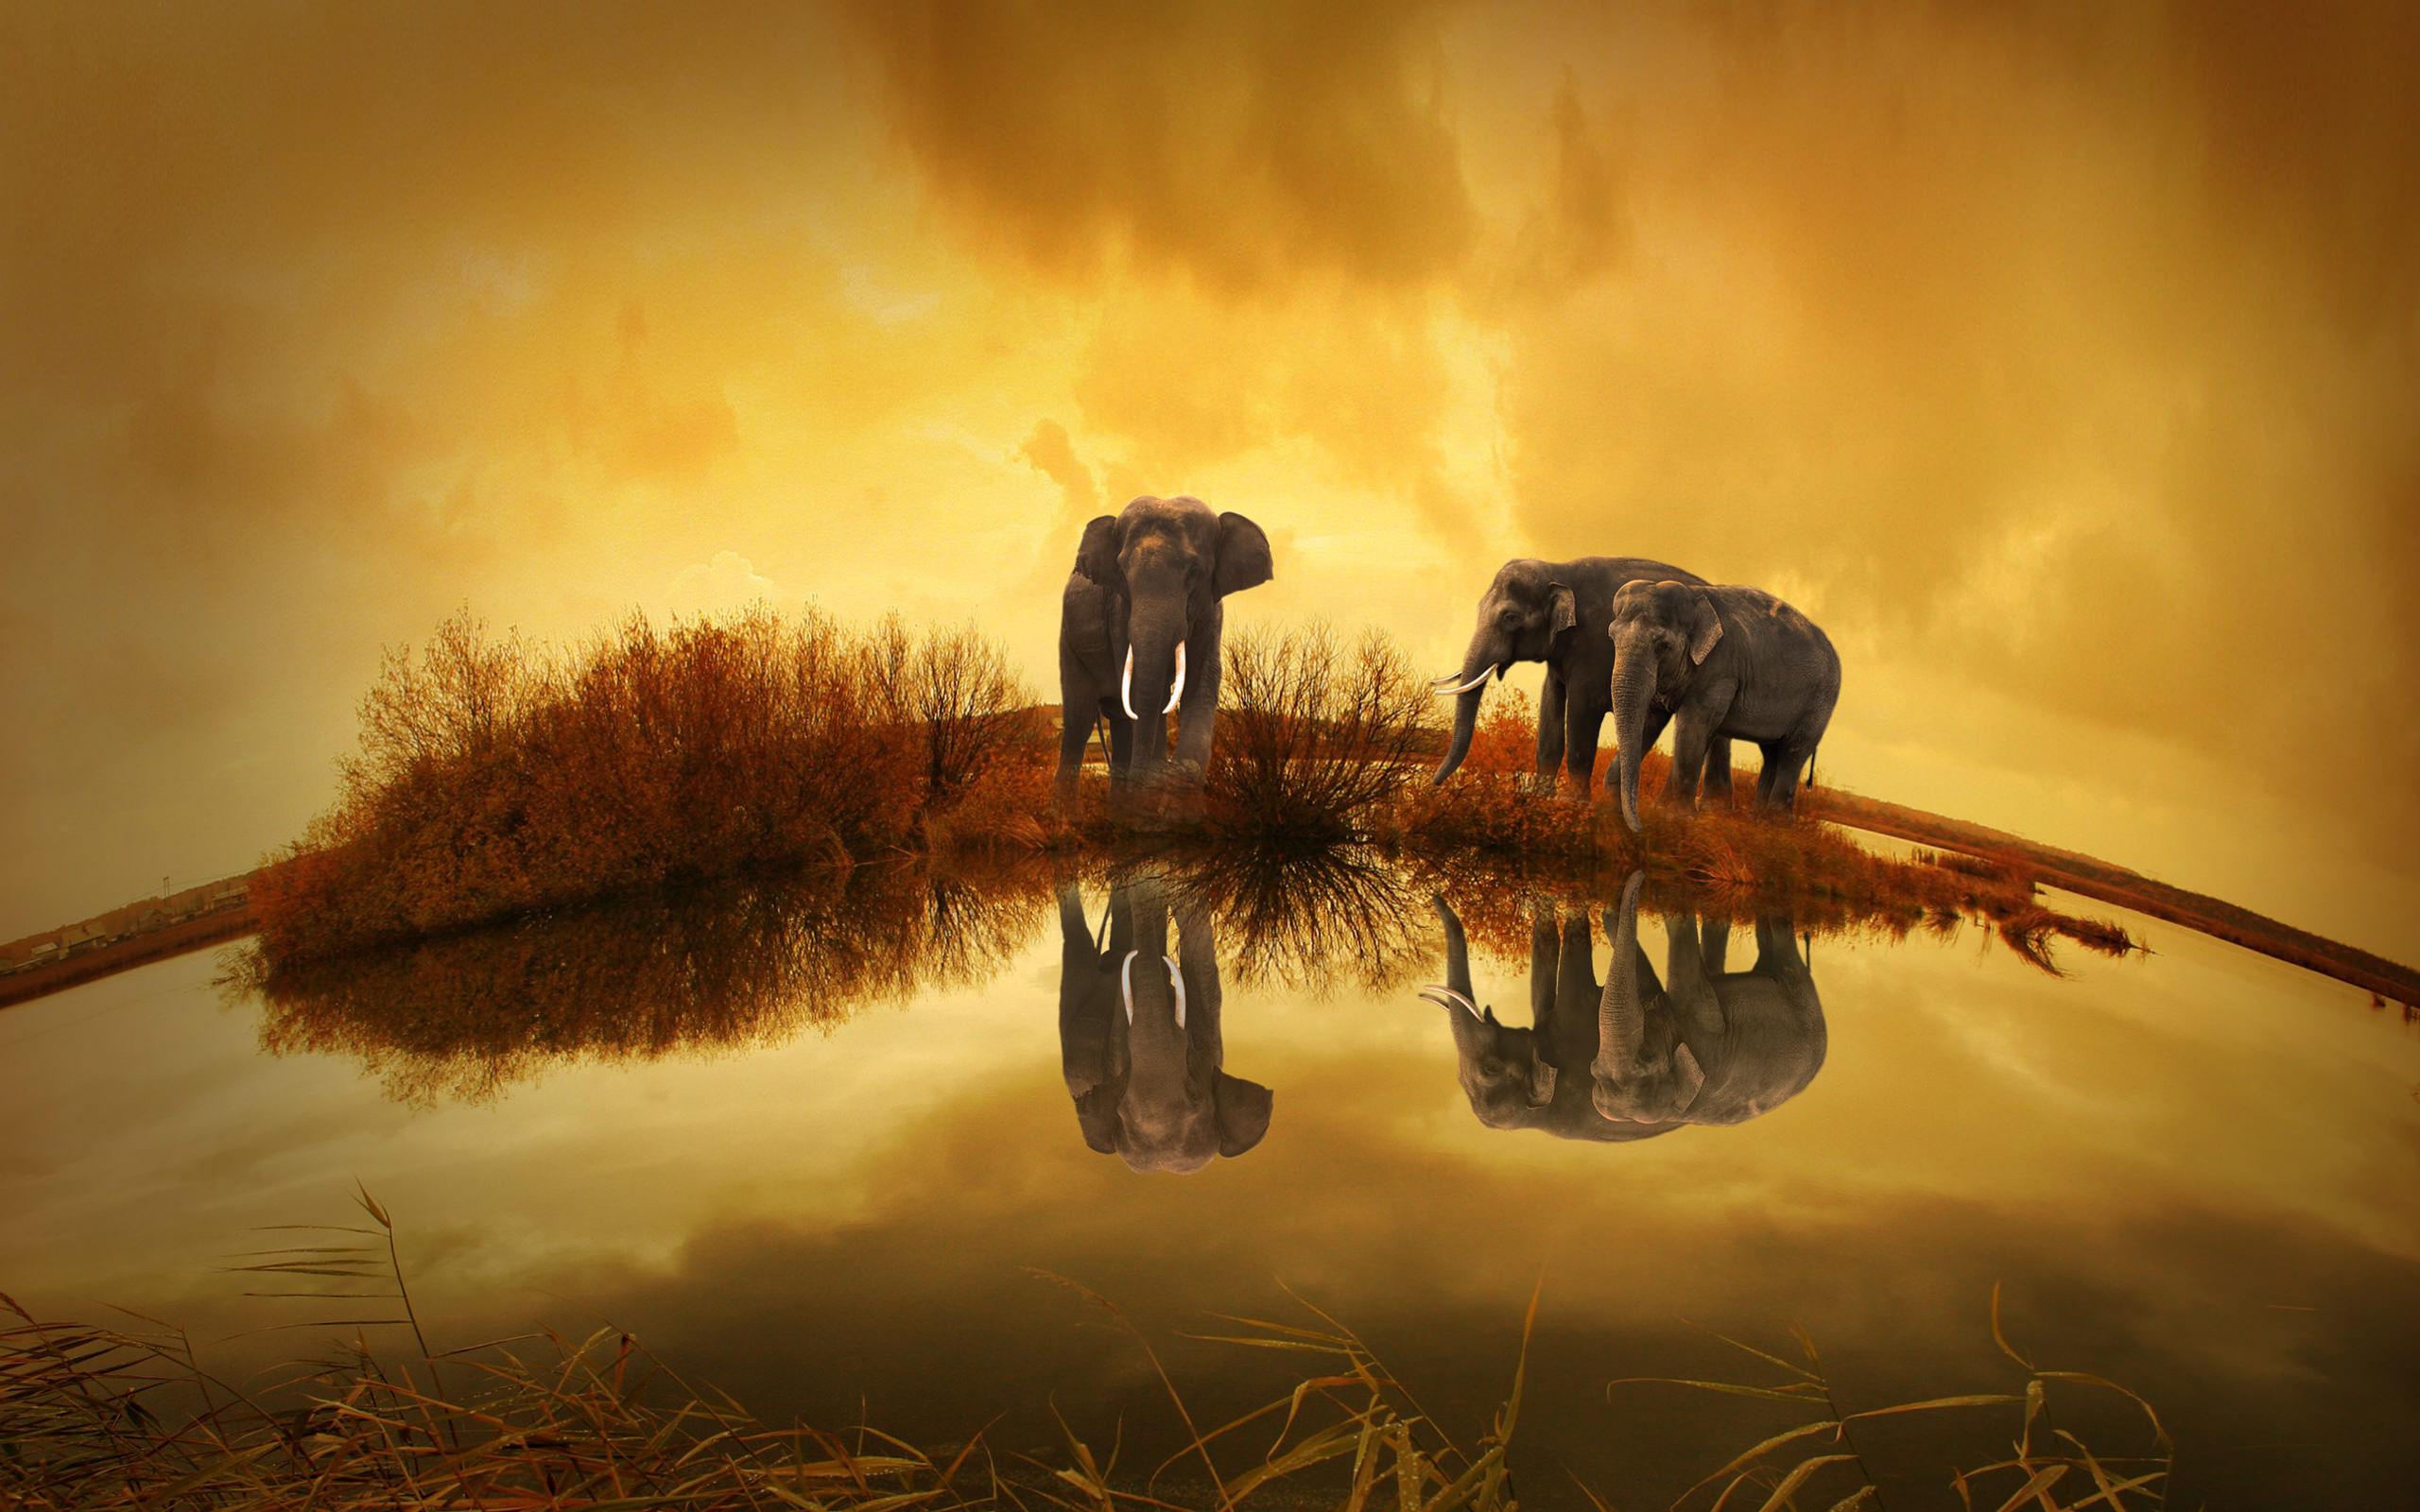 Thailand Elephants Wallpaper